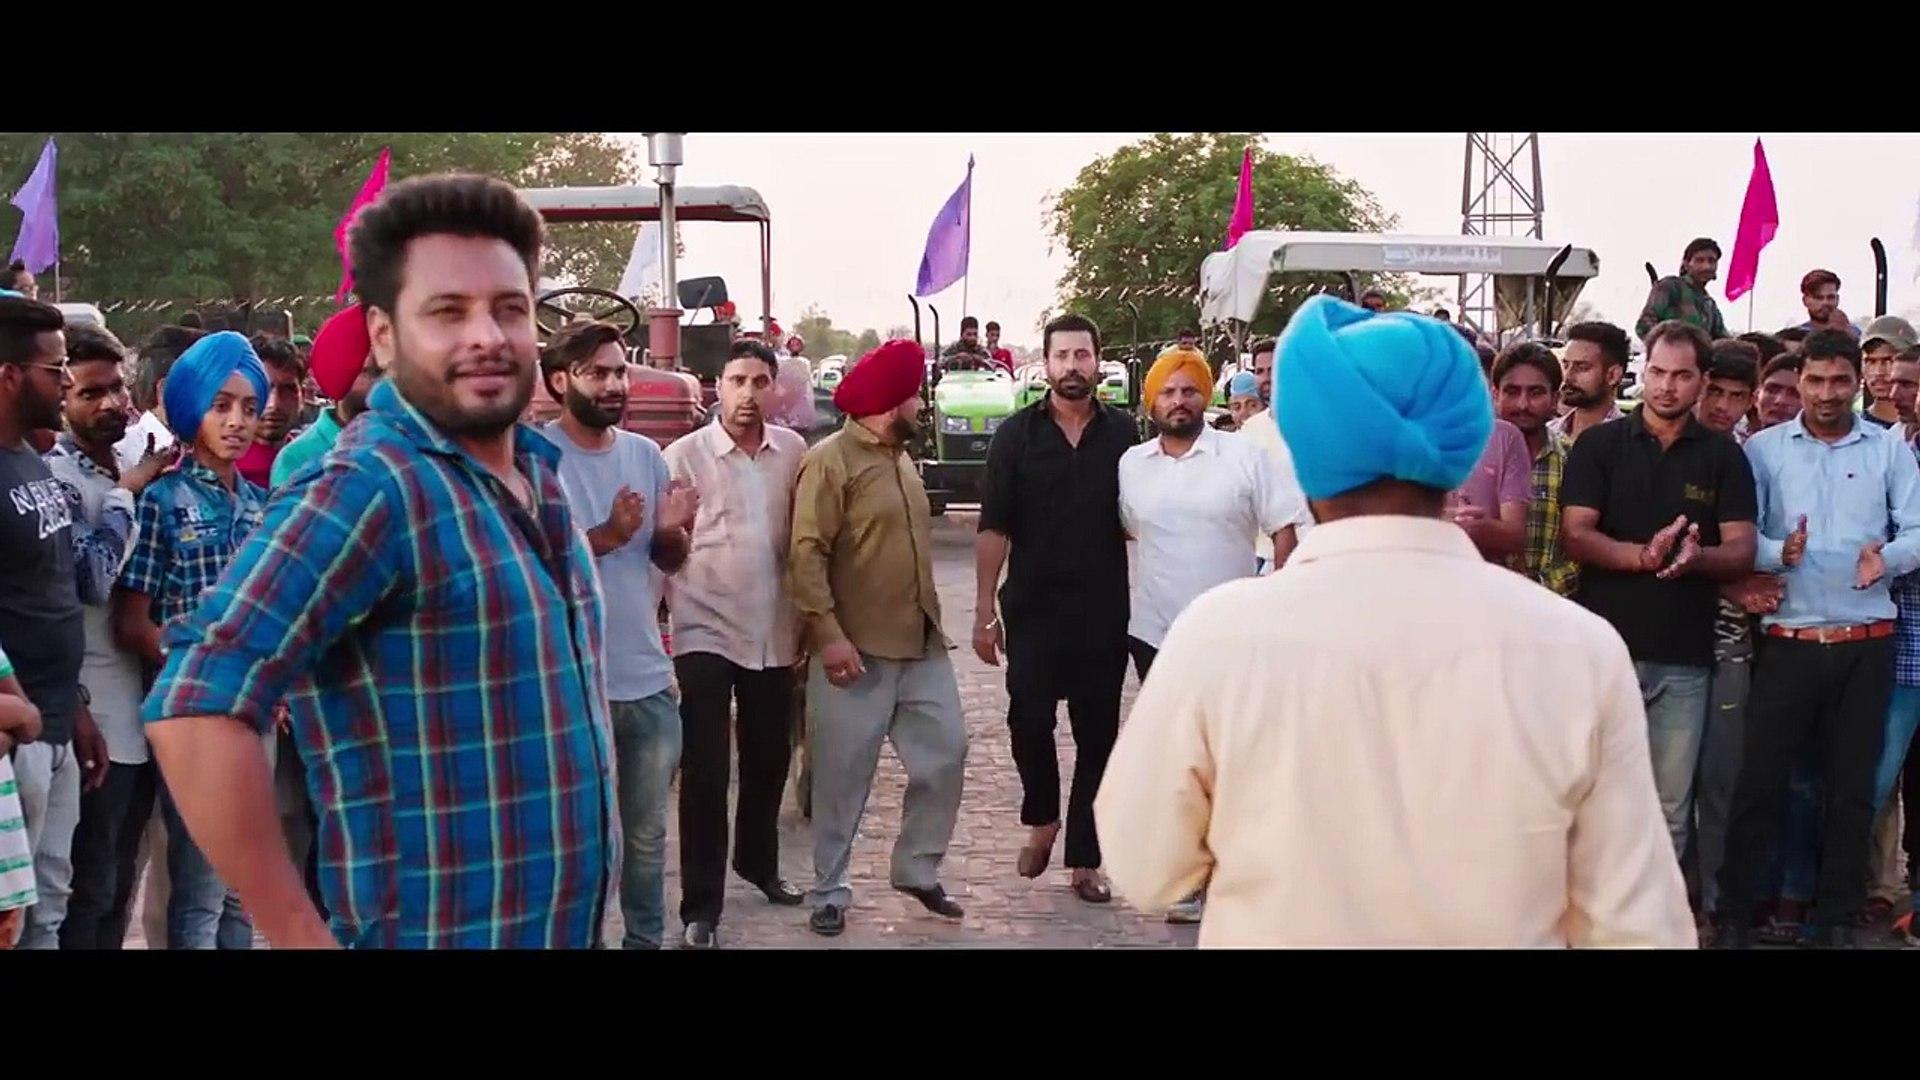 Bailaras 2017 latest punjabi movie HD Part 1